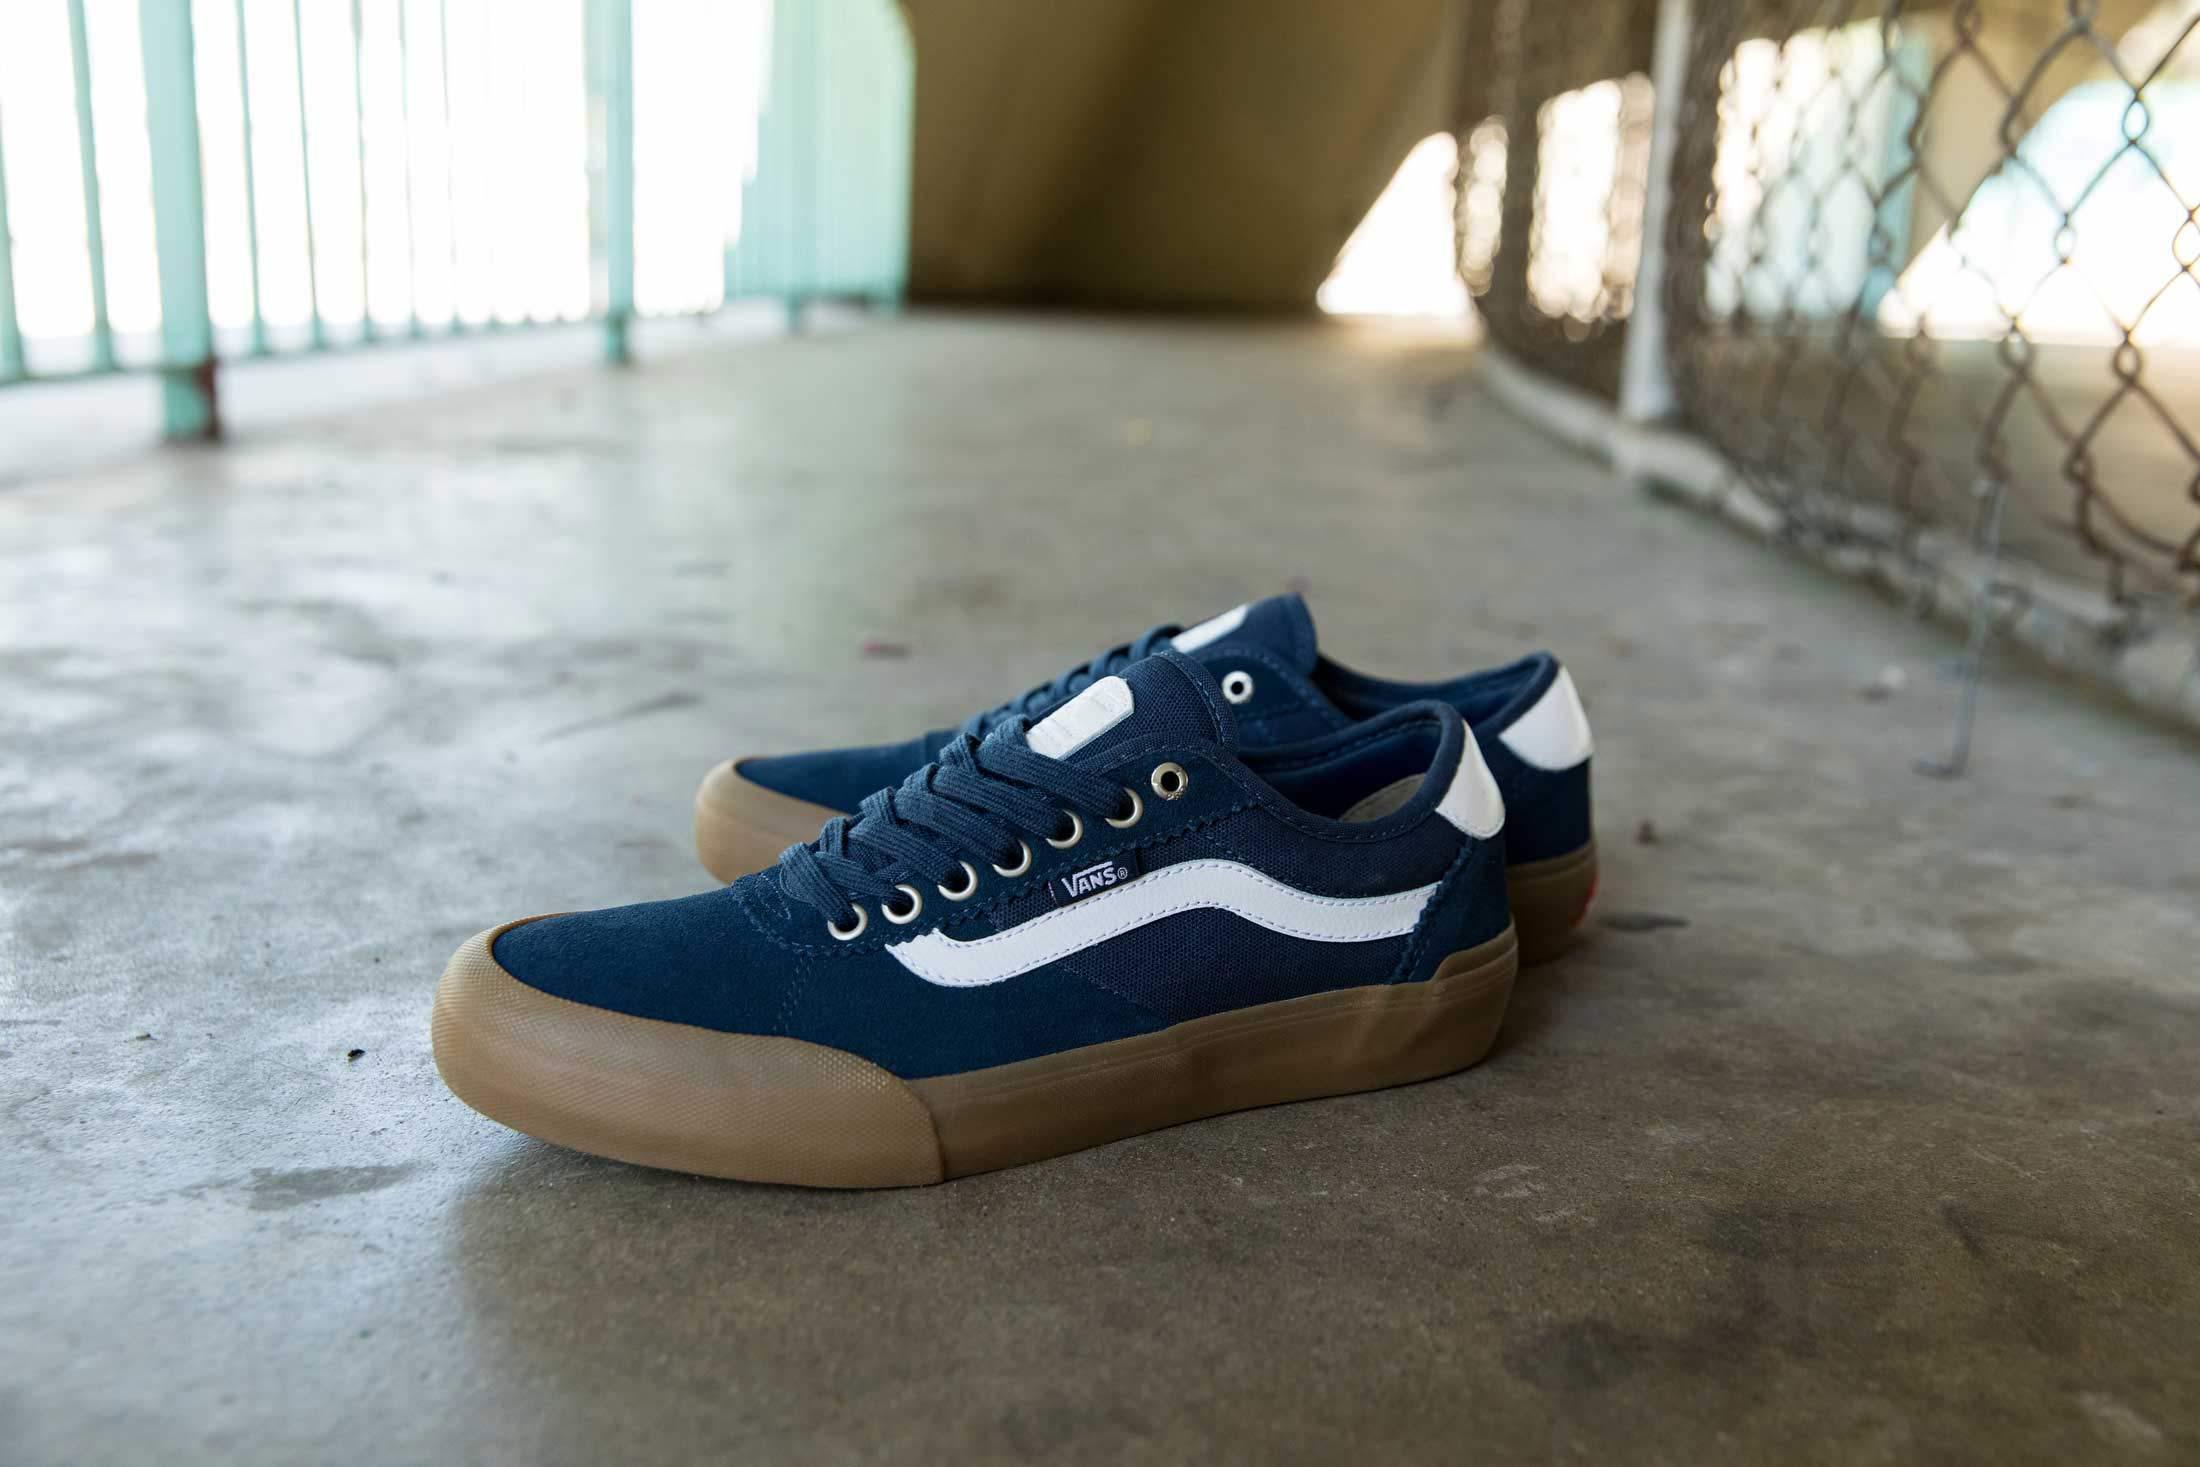 Vans Chima Pro 2 Skate Shoe release